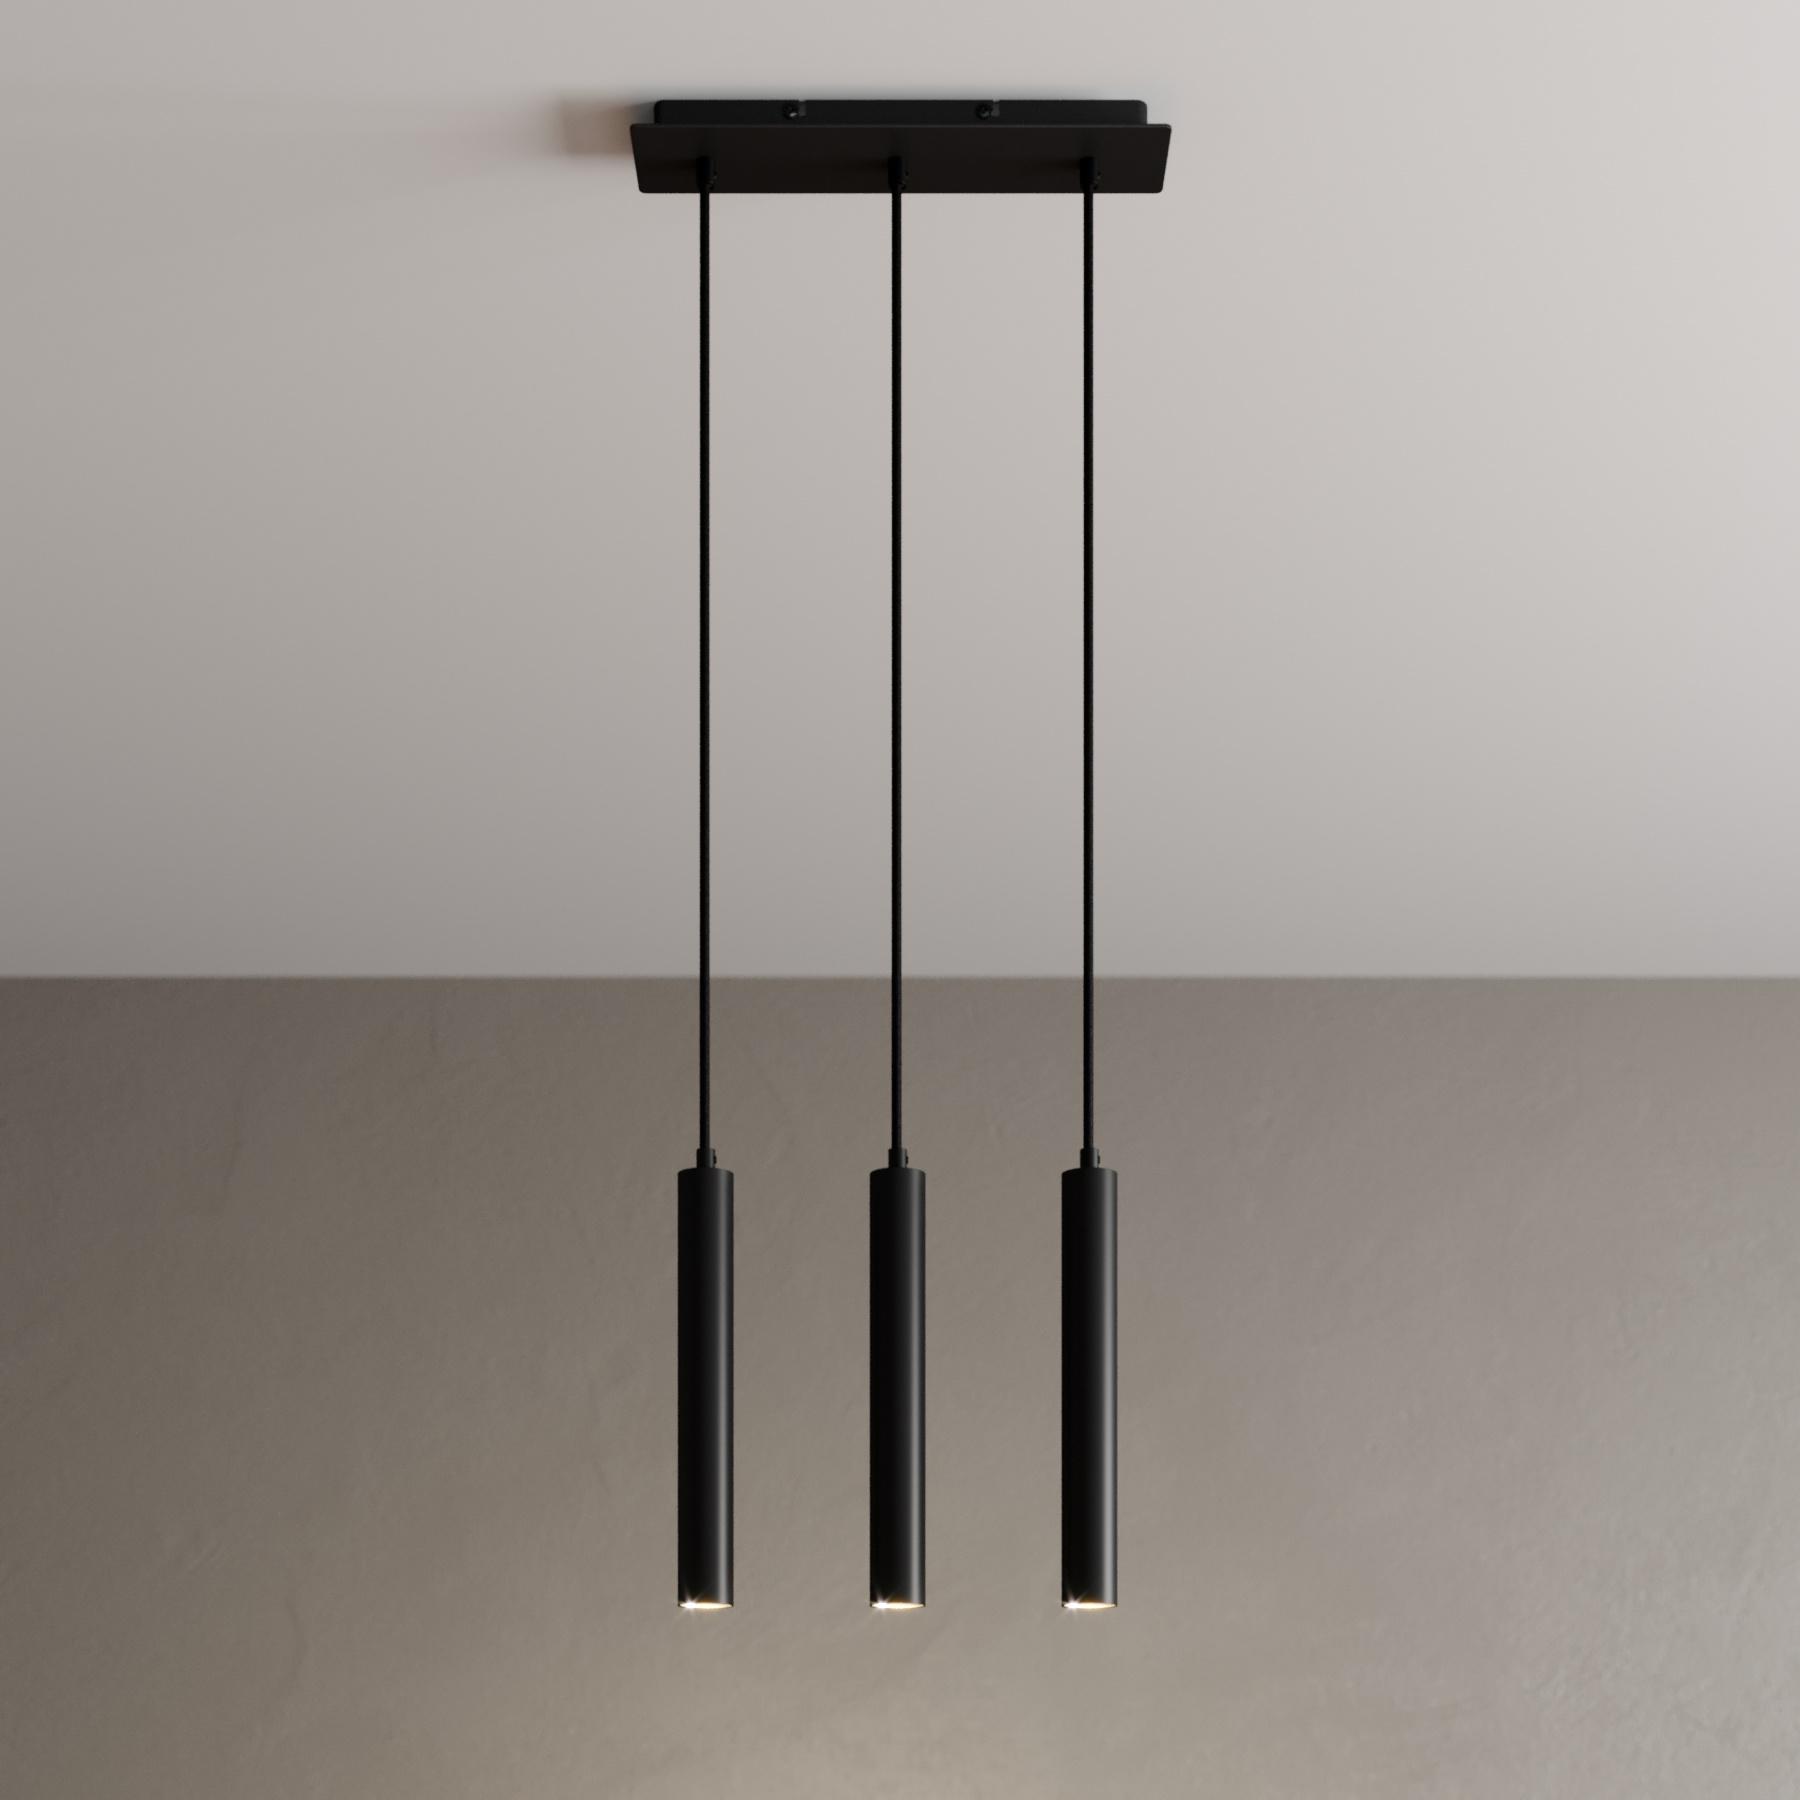 Arcchio Franka LED-Pendelleuchte, 3-flammig lang